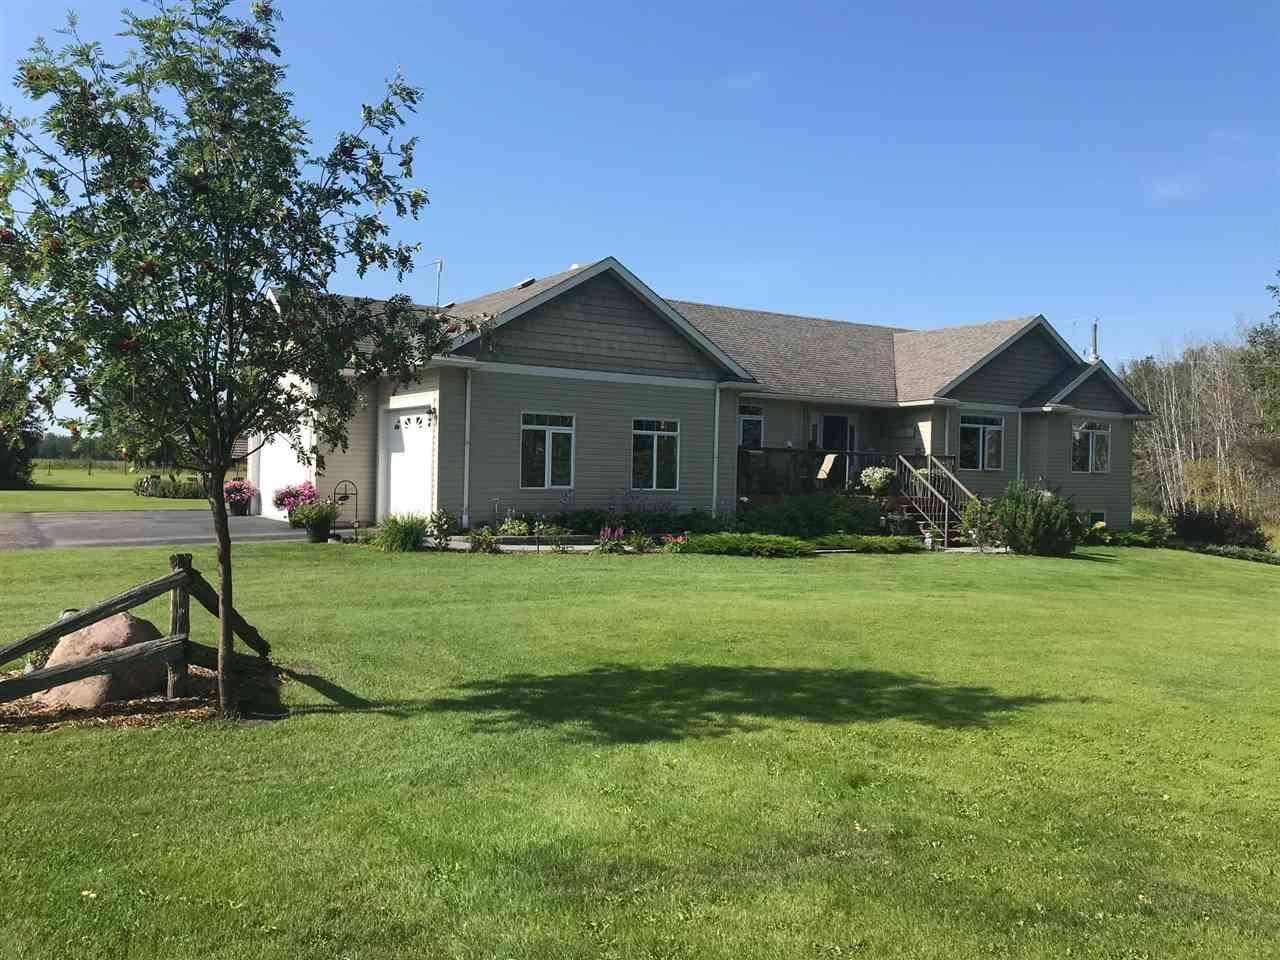 House for sale at 43313 Twp Rd Rural Bonnyville M.d. Alberta - MLS: E4195905